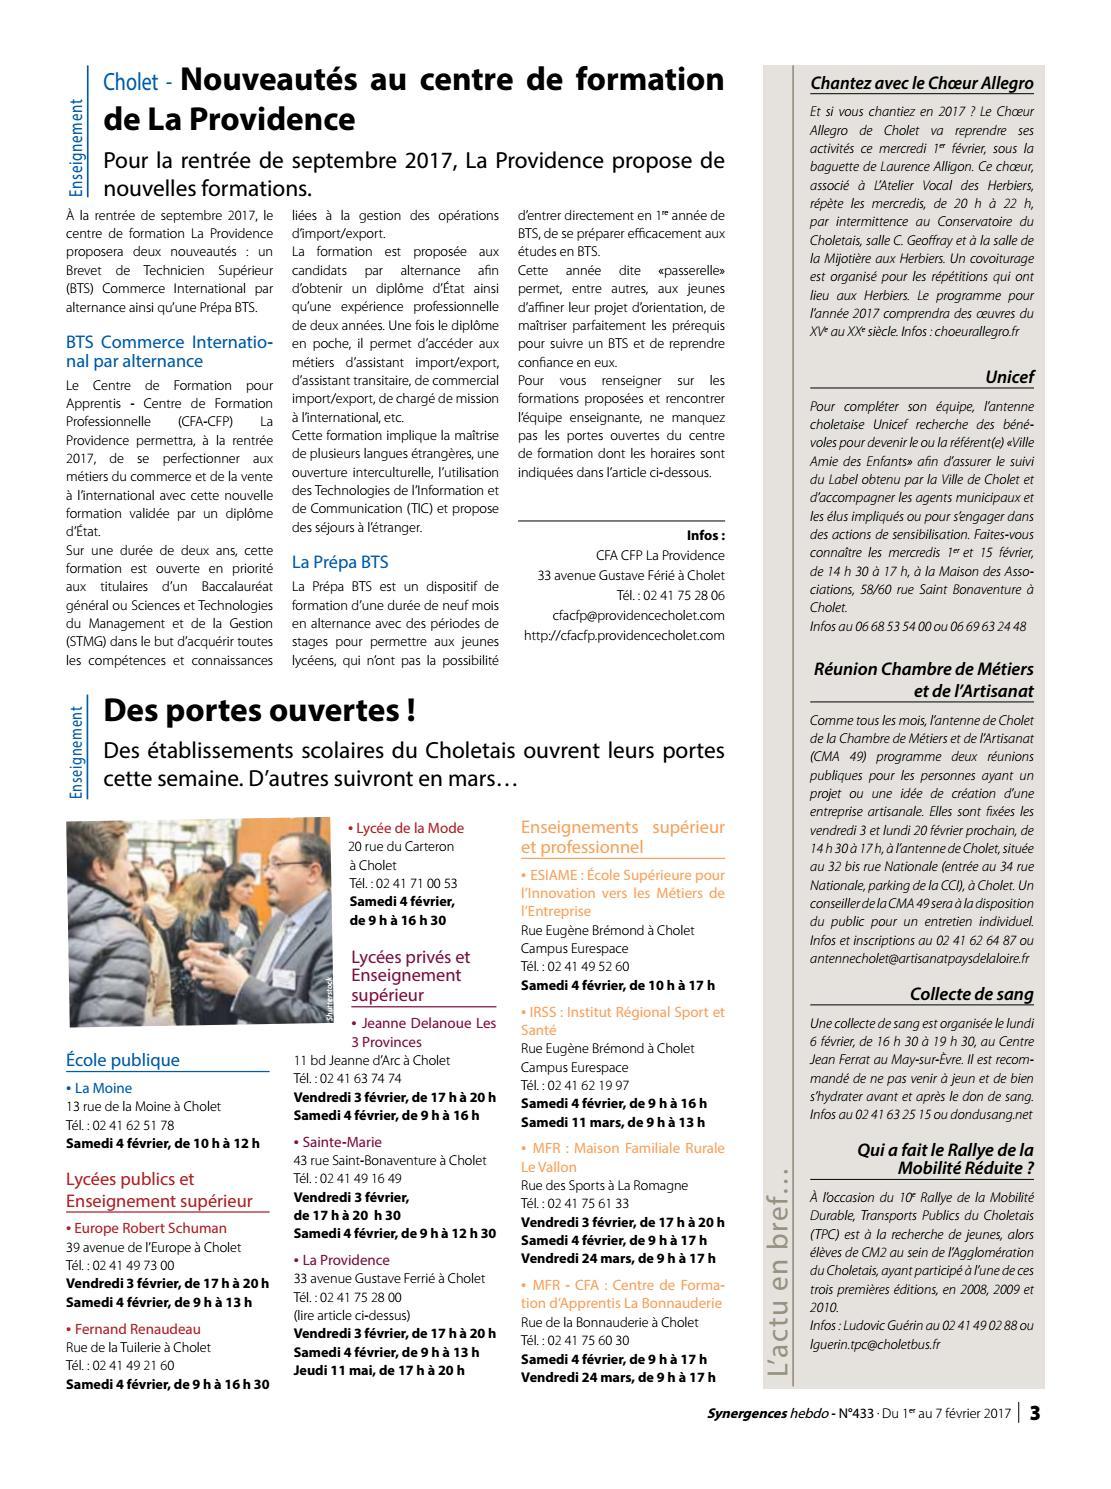 synergences hebdo n°433 by agglomération du choletais - issuu